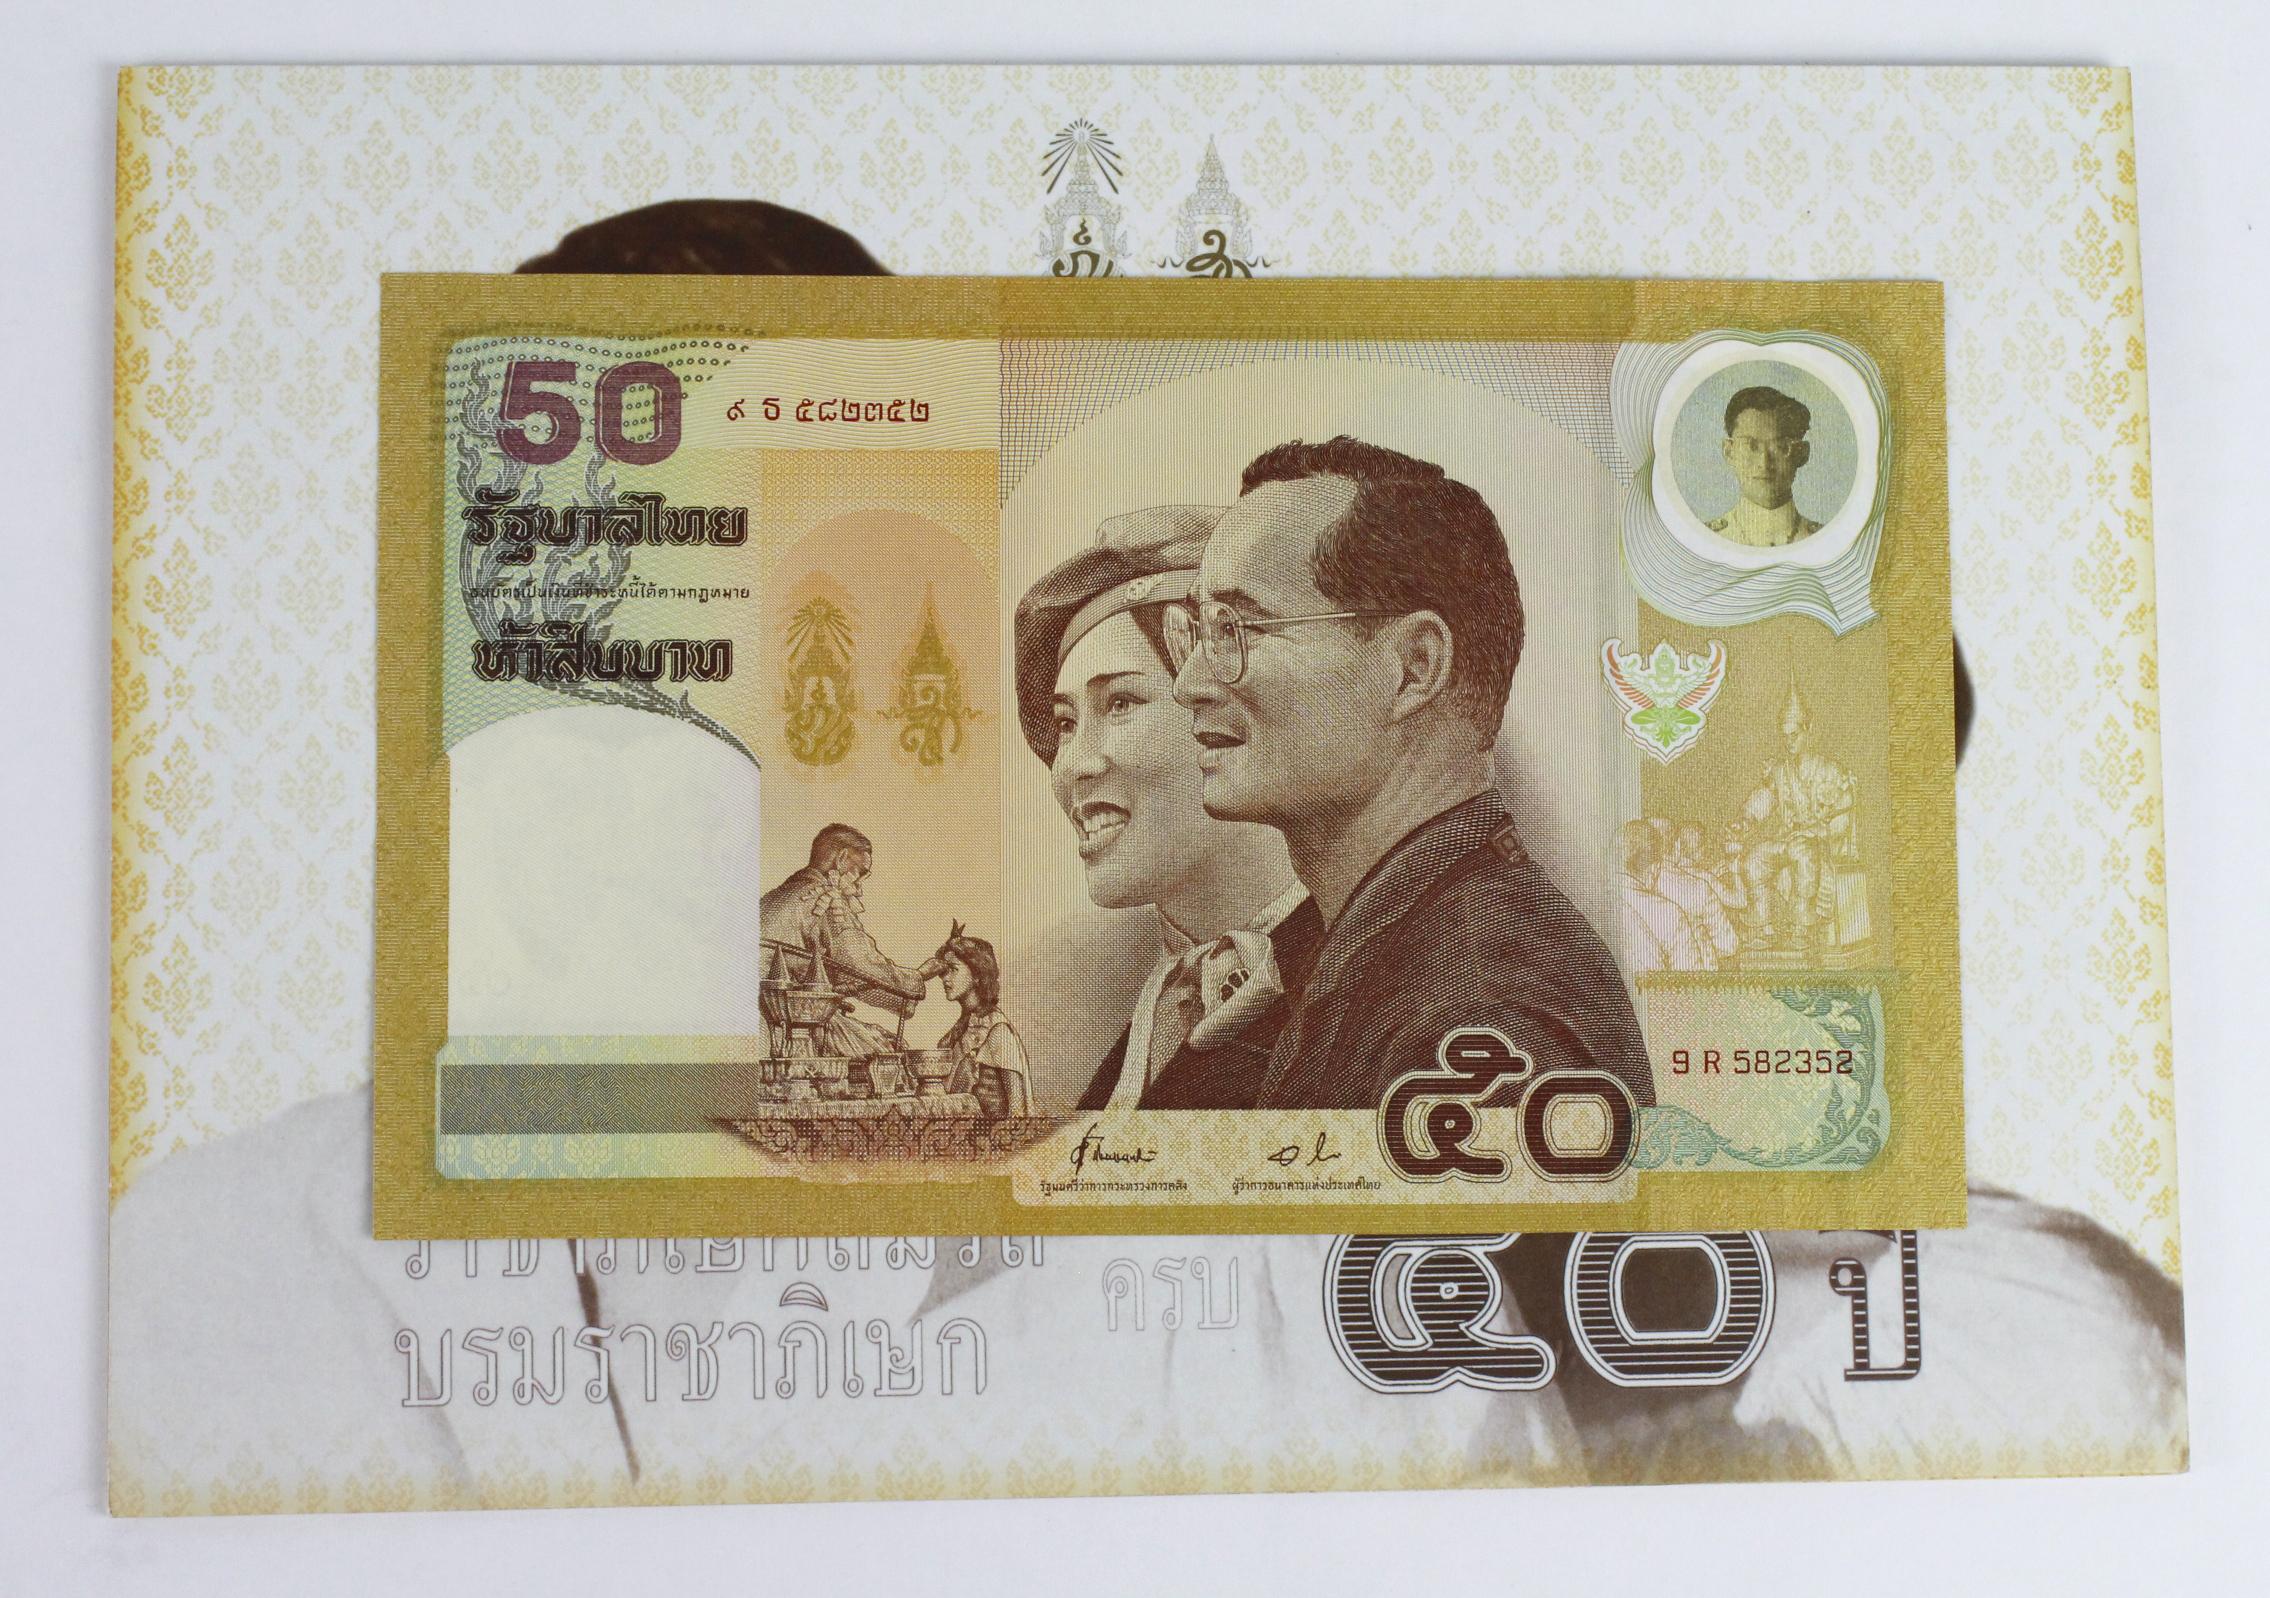 Thailand 50 Baht issued 2000, commemorative note Golden Wedding Anniversary, in presentation folder,